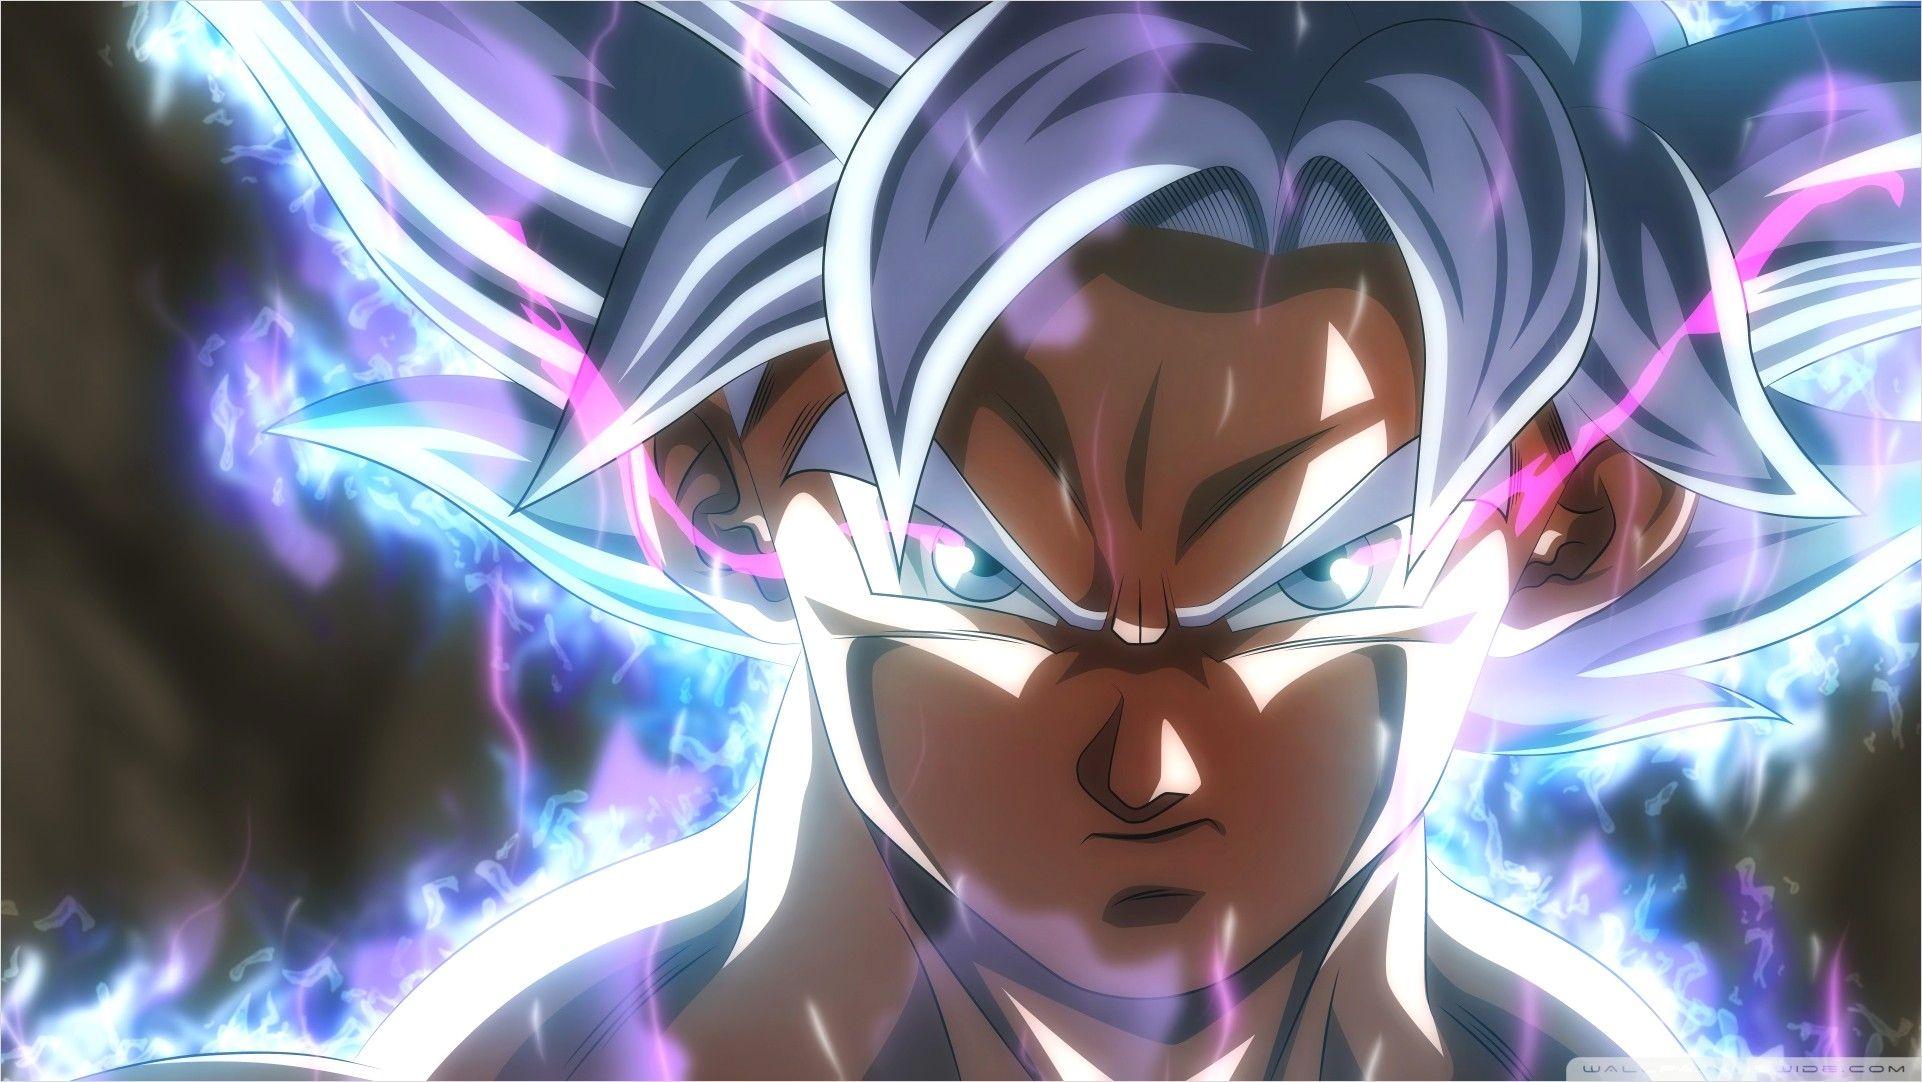 Goku Ultra Instinct 4k Wallpaper In 2020 Goku Wallpaper Dragon Ball Wallpapers Dragon Ball Super Wallpapers